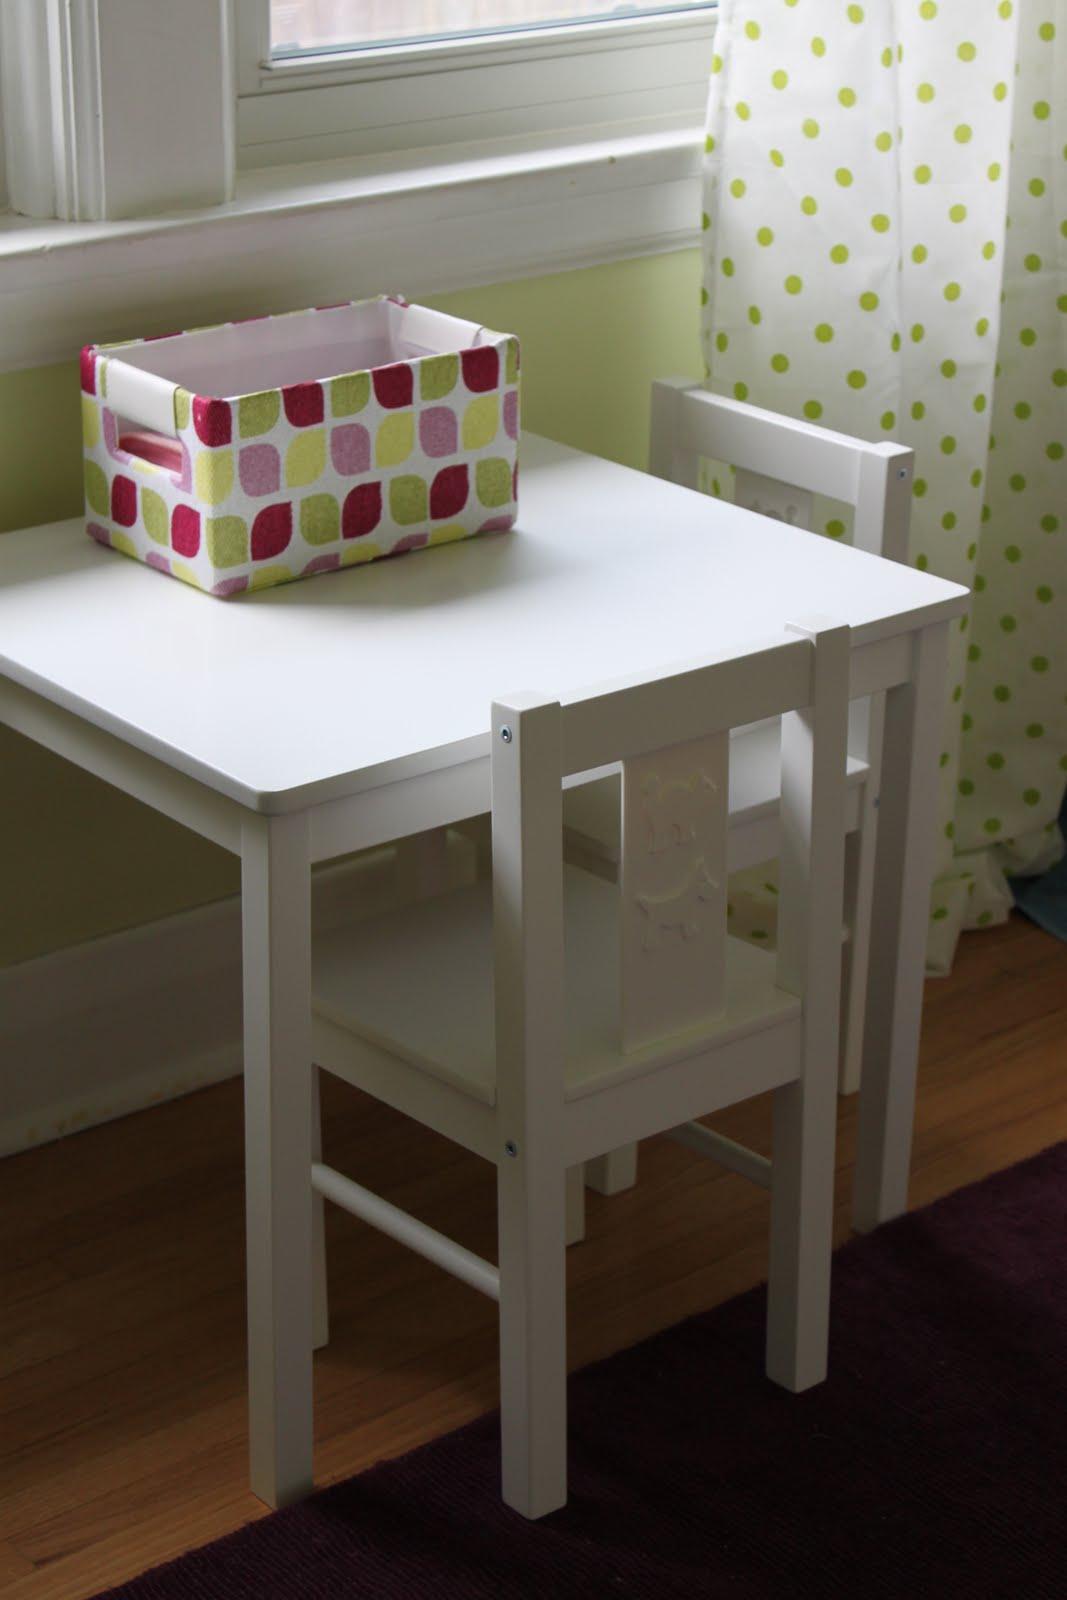 kritter ikea table bed mattress sale. Black Bedroom Furniture Sets. Home Design Ideas